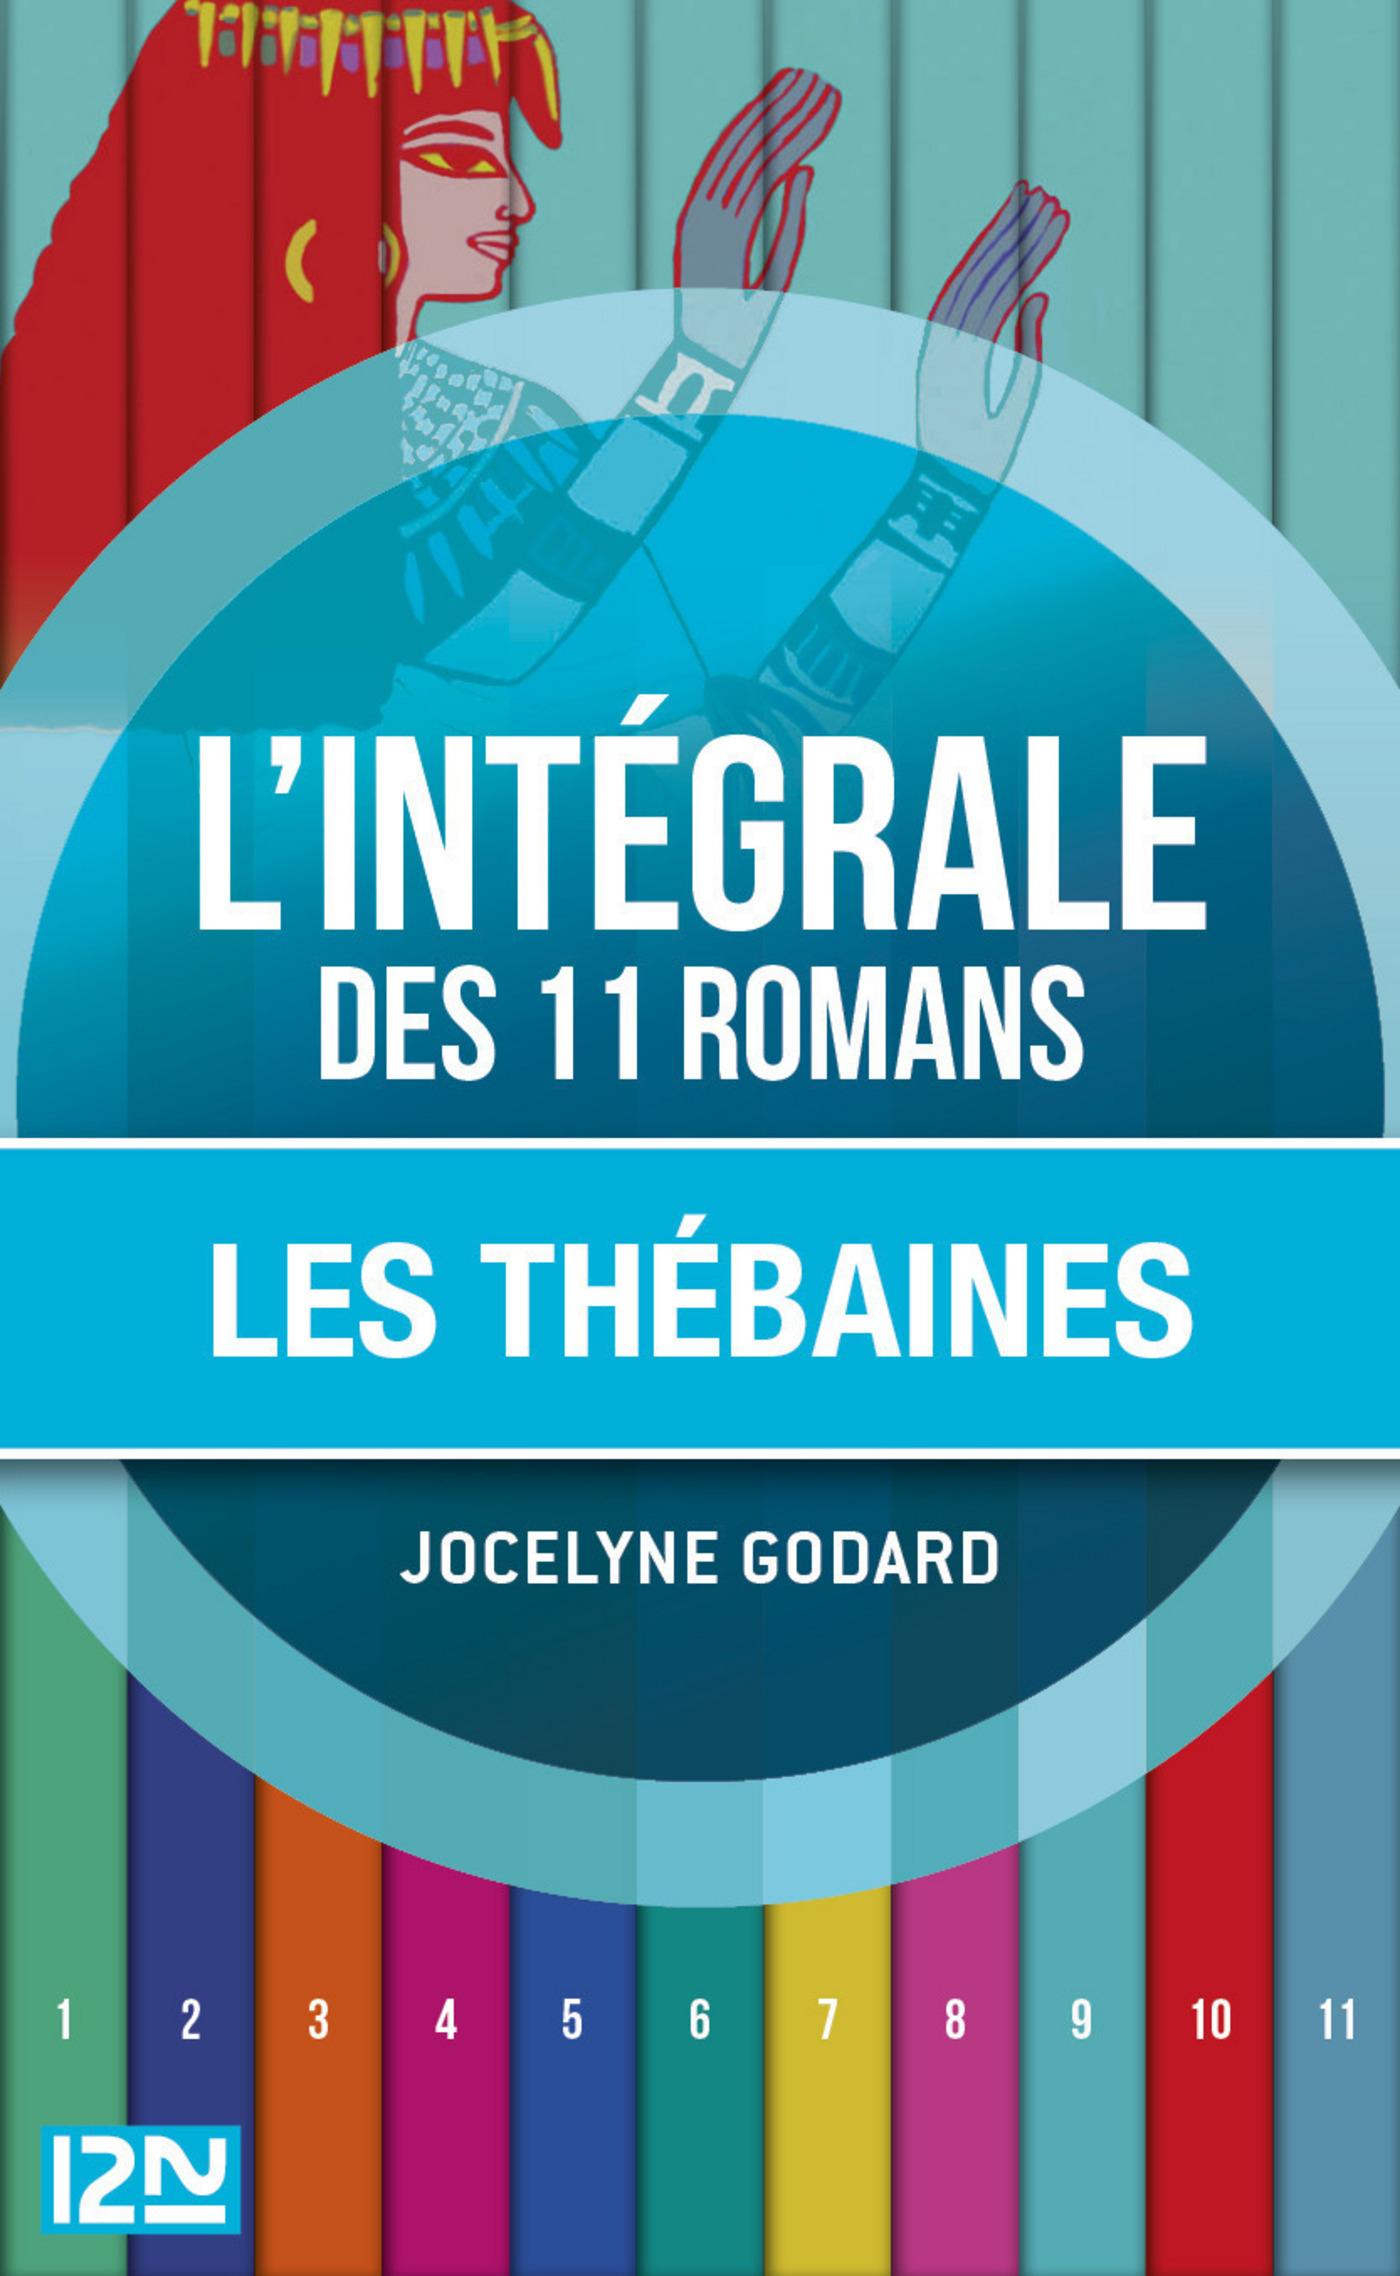 Intégrale Les Thébaines (ebook)